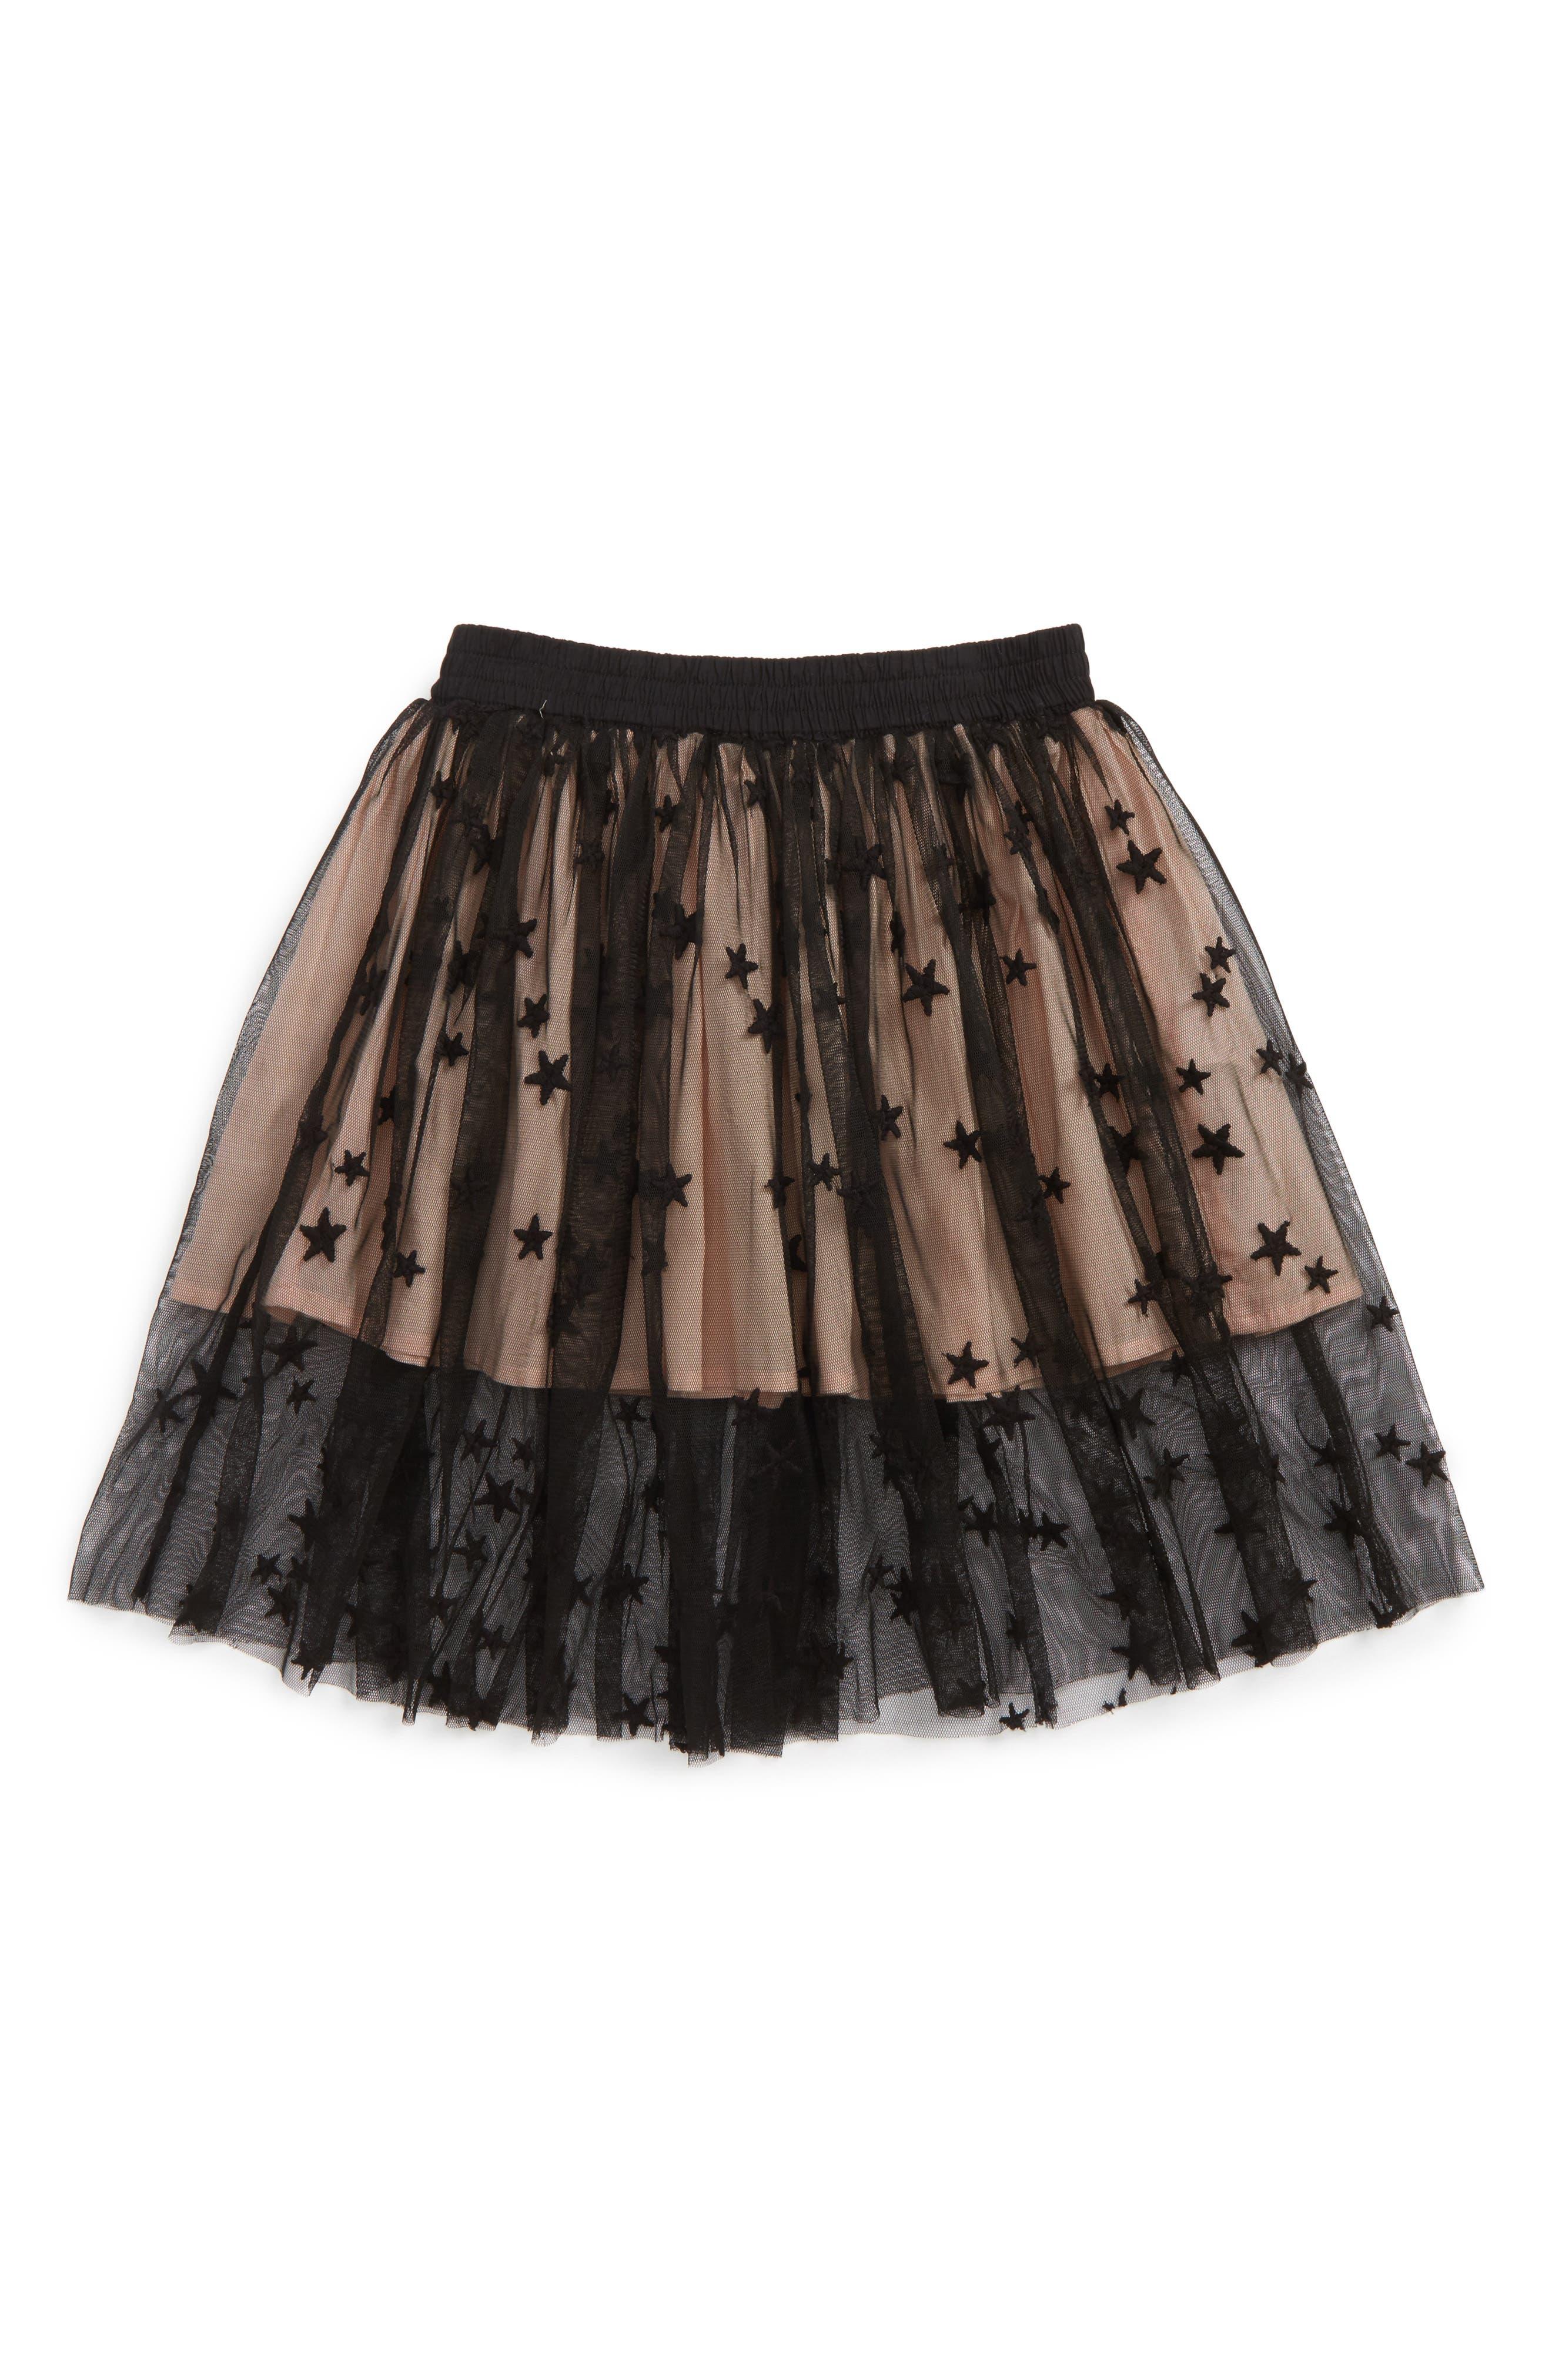 STELLA MCCARTNEY Kids Amalie Star Tulle Skirt